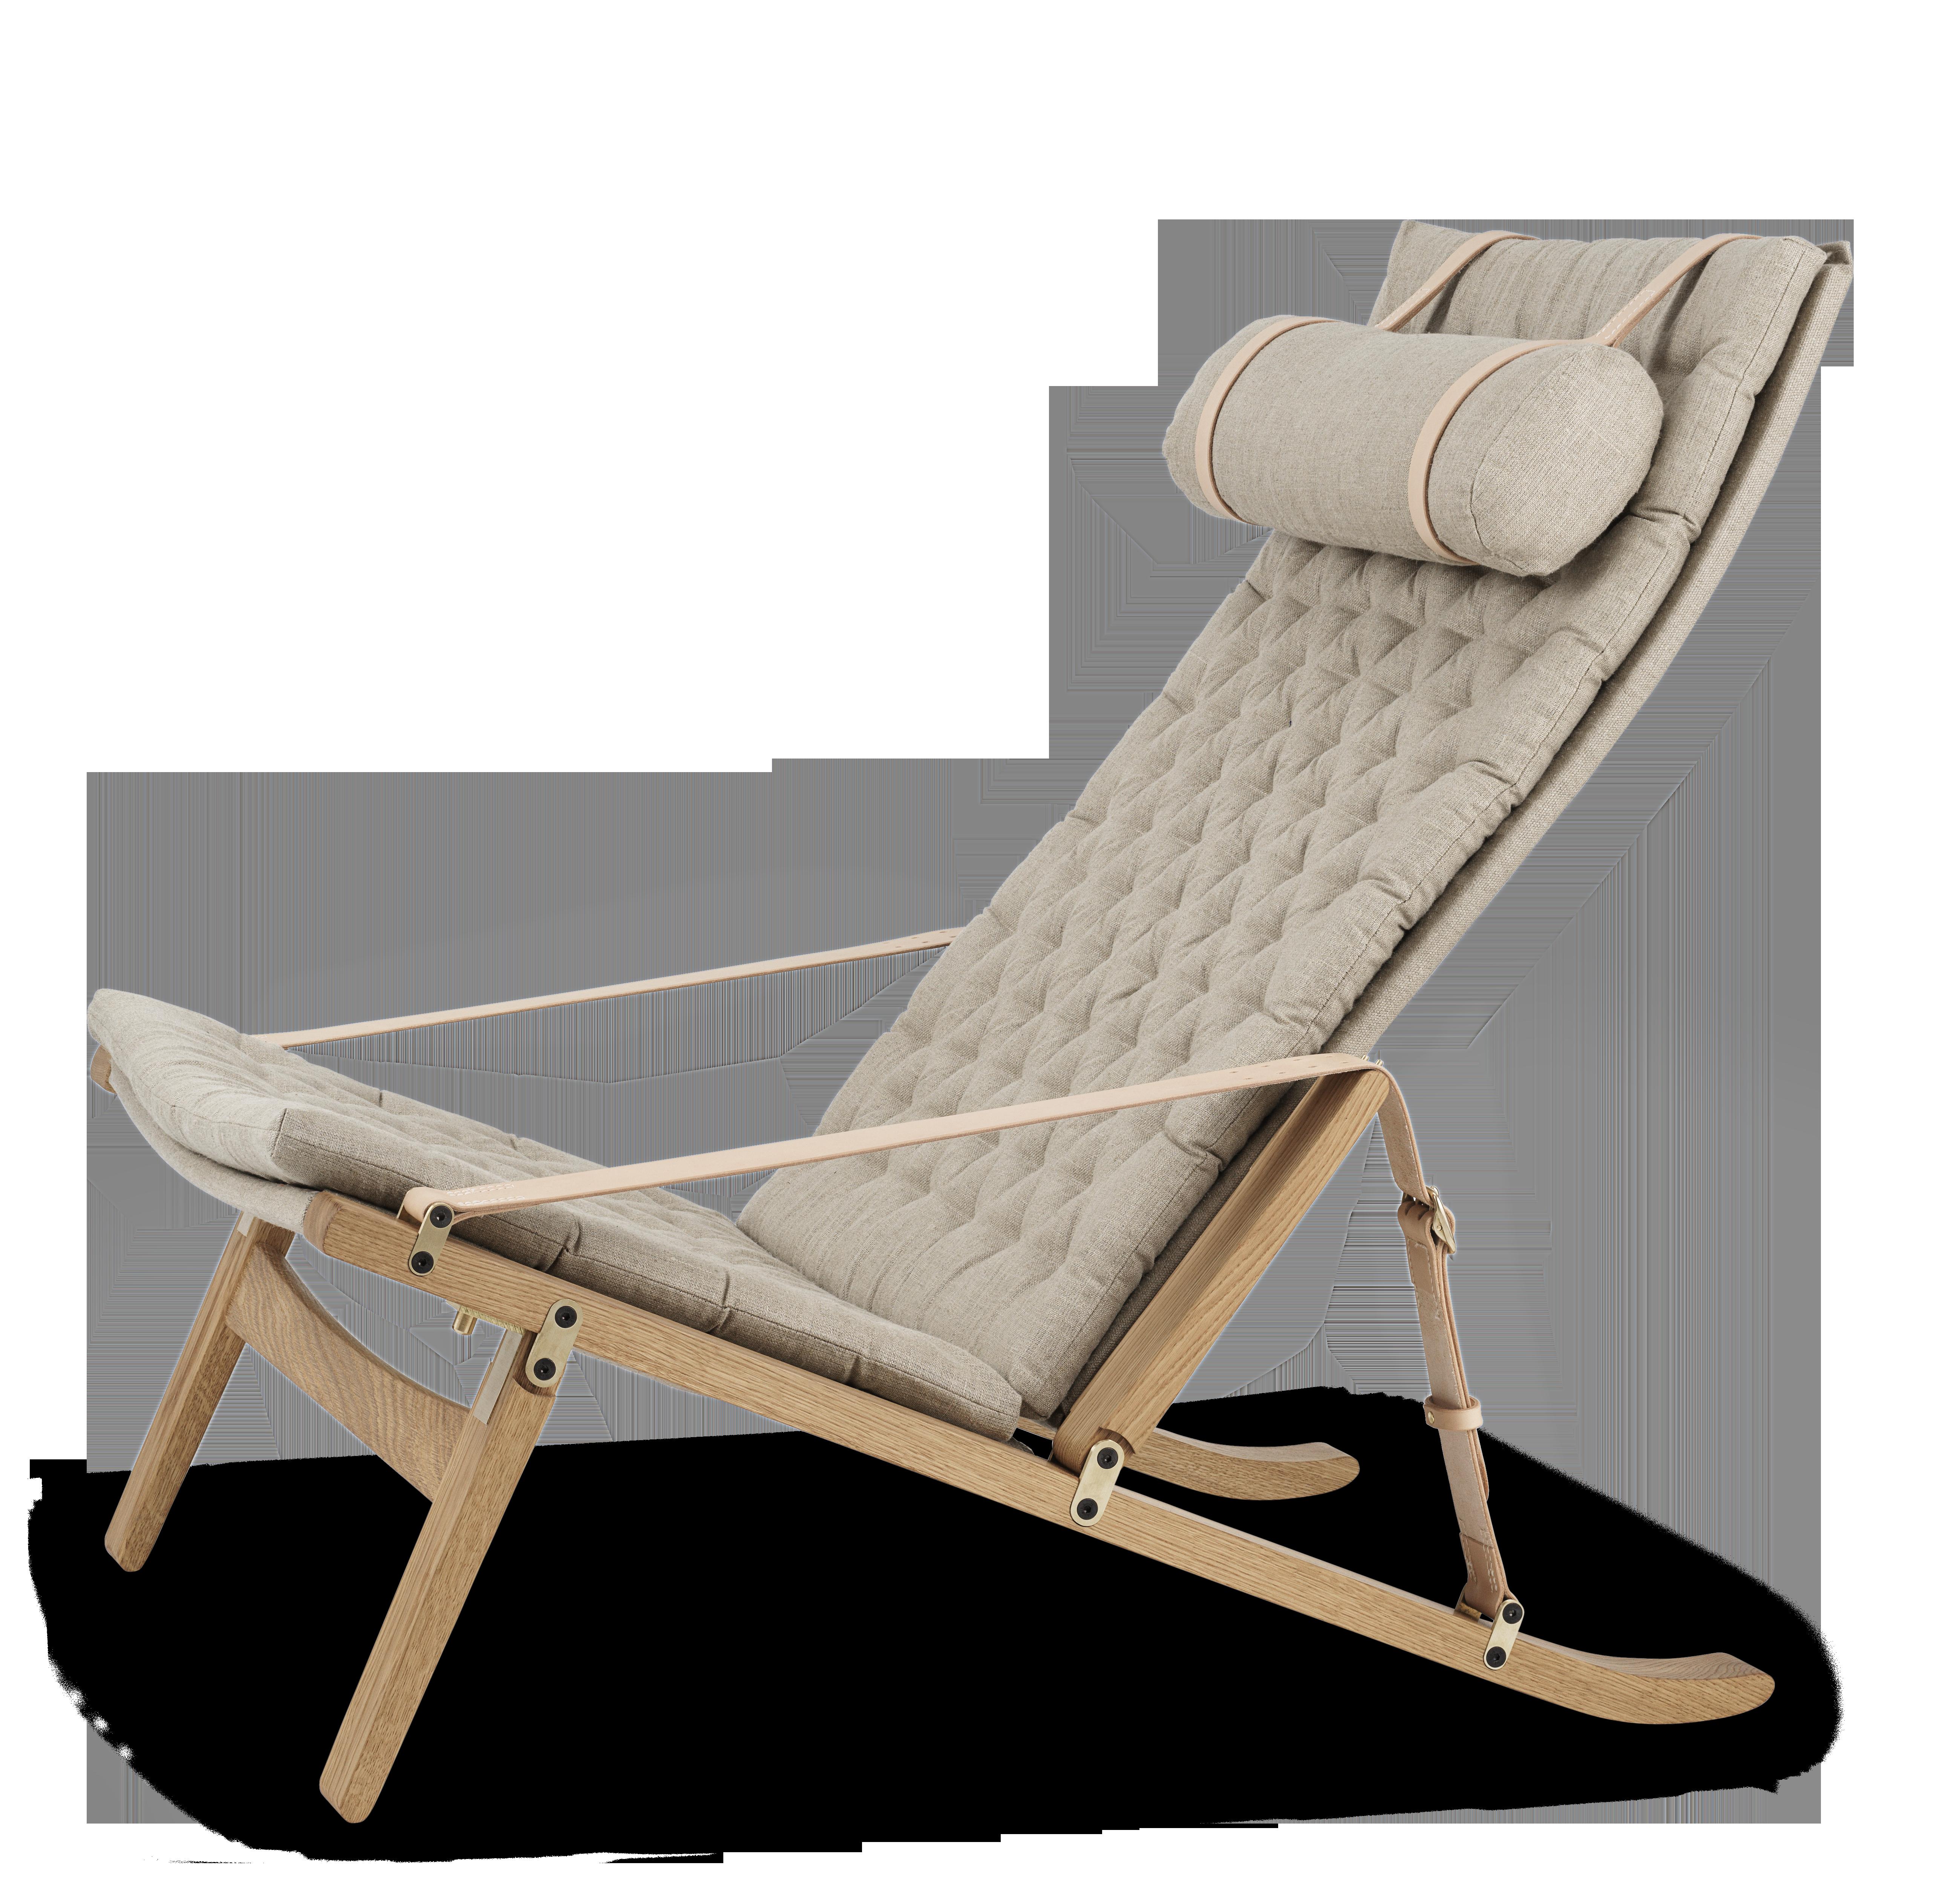 FK10 | Plico chair